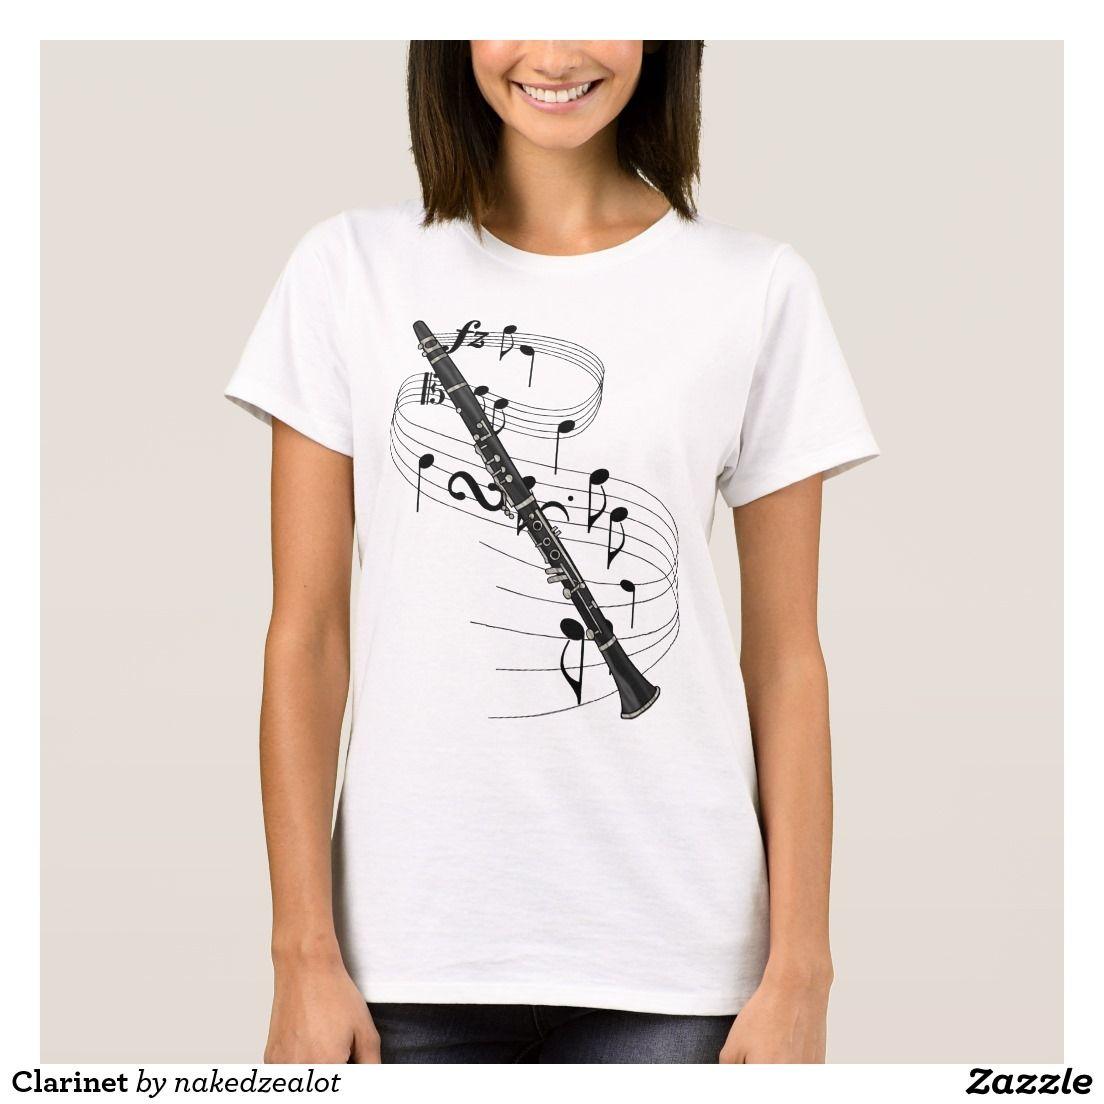 Clarinet T-Shirt | Marching Band awesomeness! | Pinterest